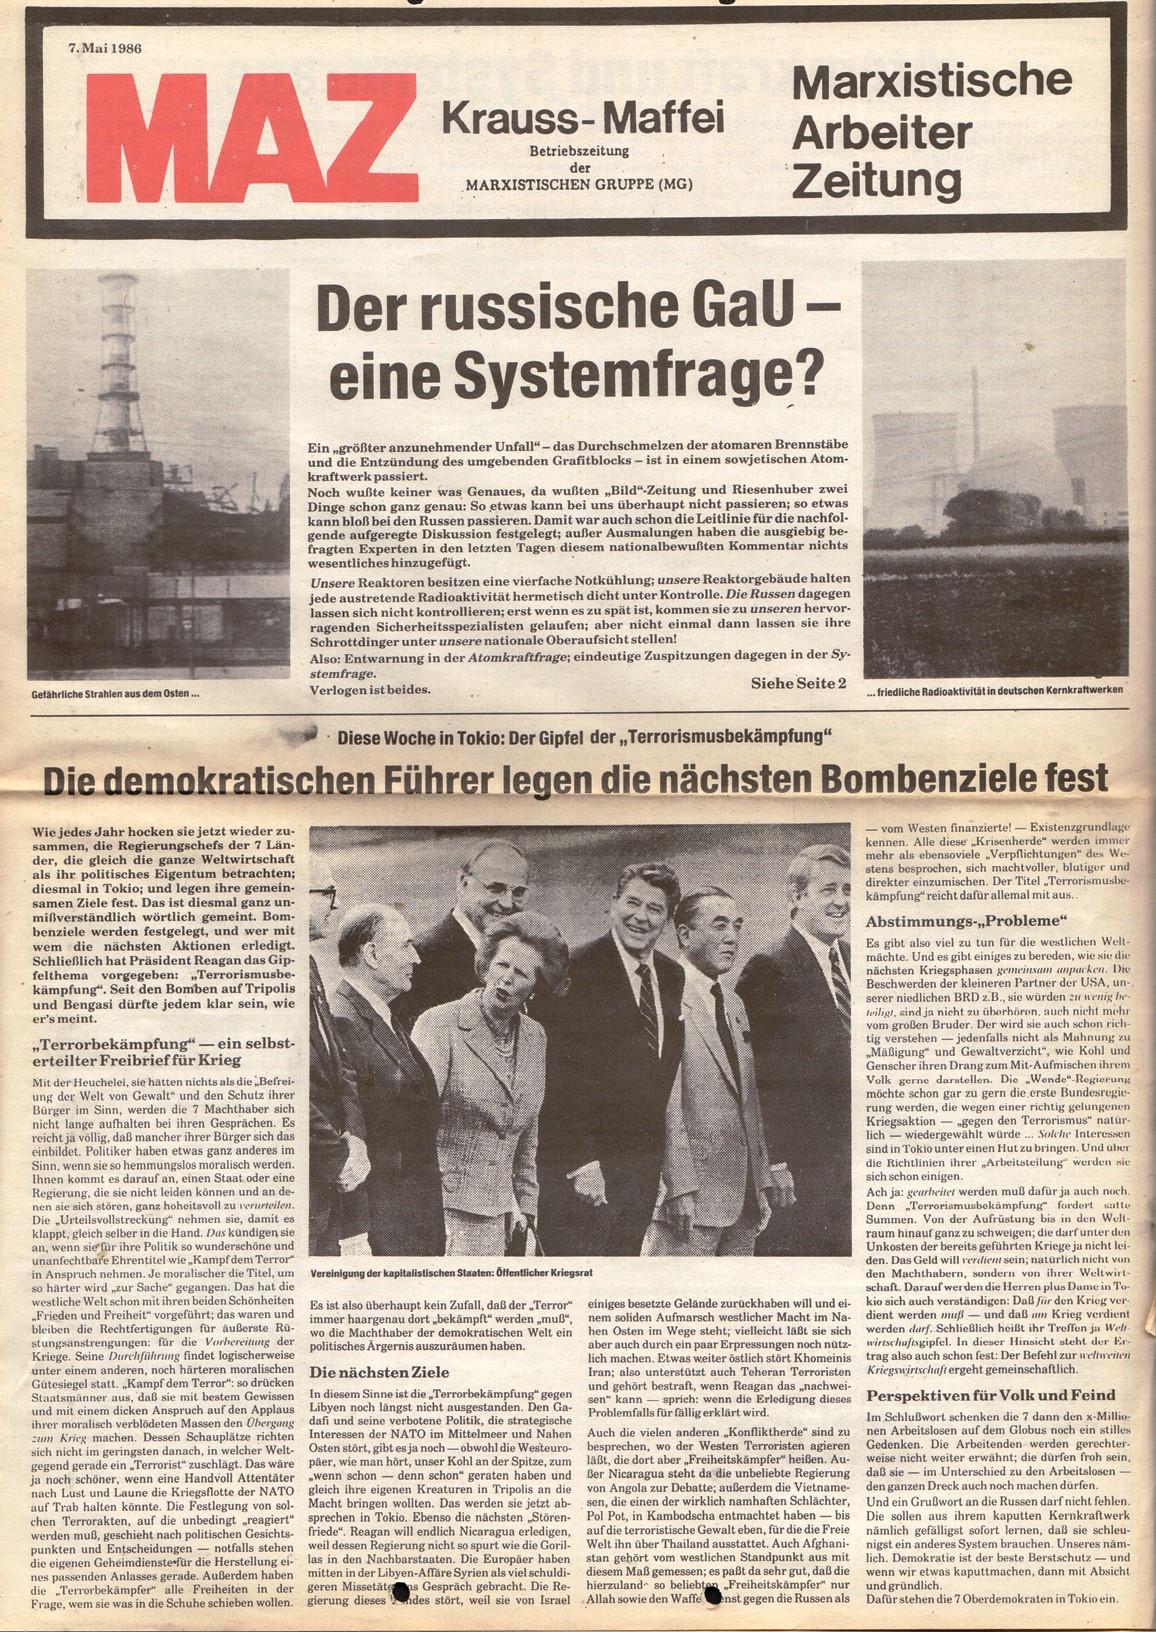 Muenchen_MG_MAZ_Krauss_Maffei_19860507_01